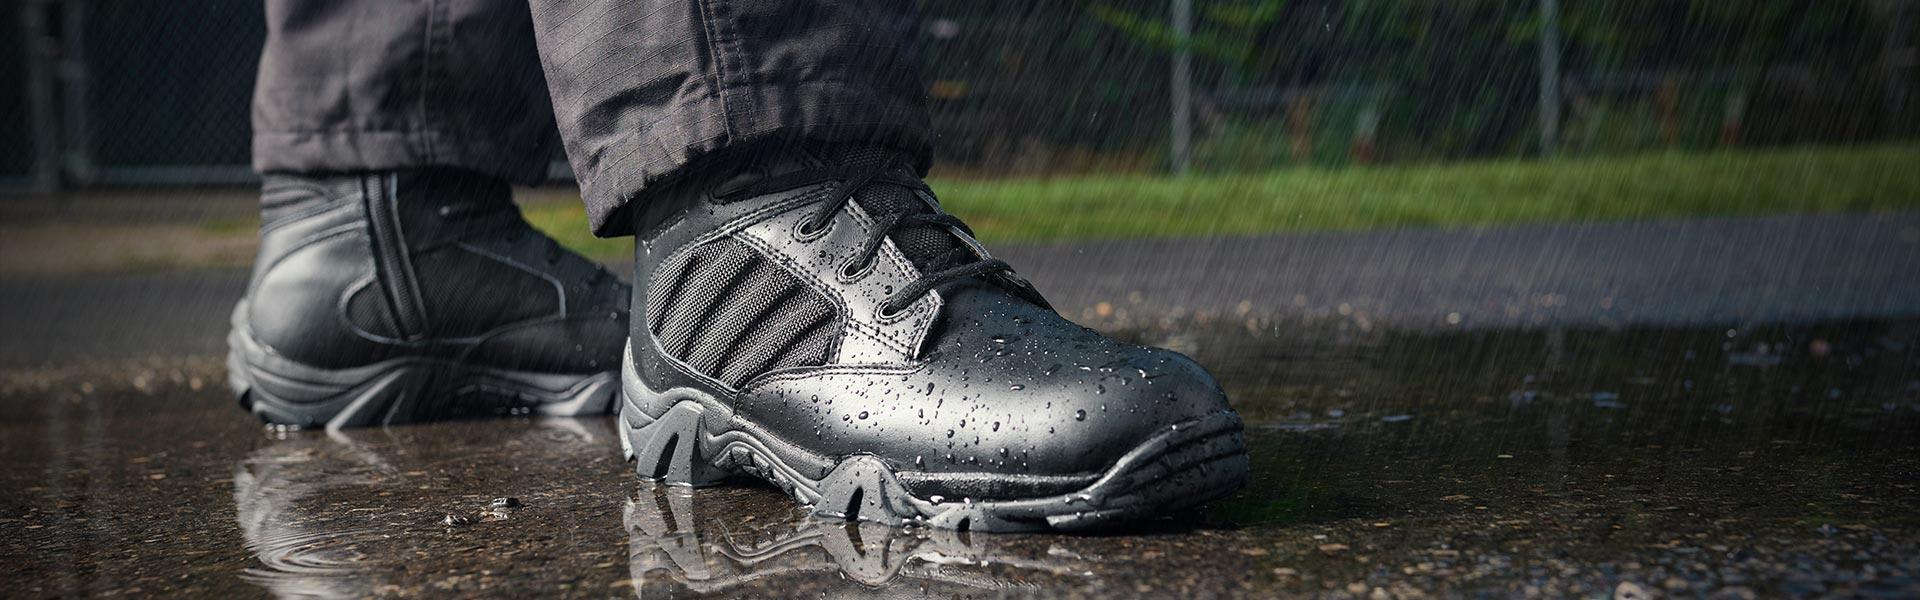 Bates black Waterproof boots.